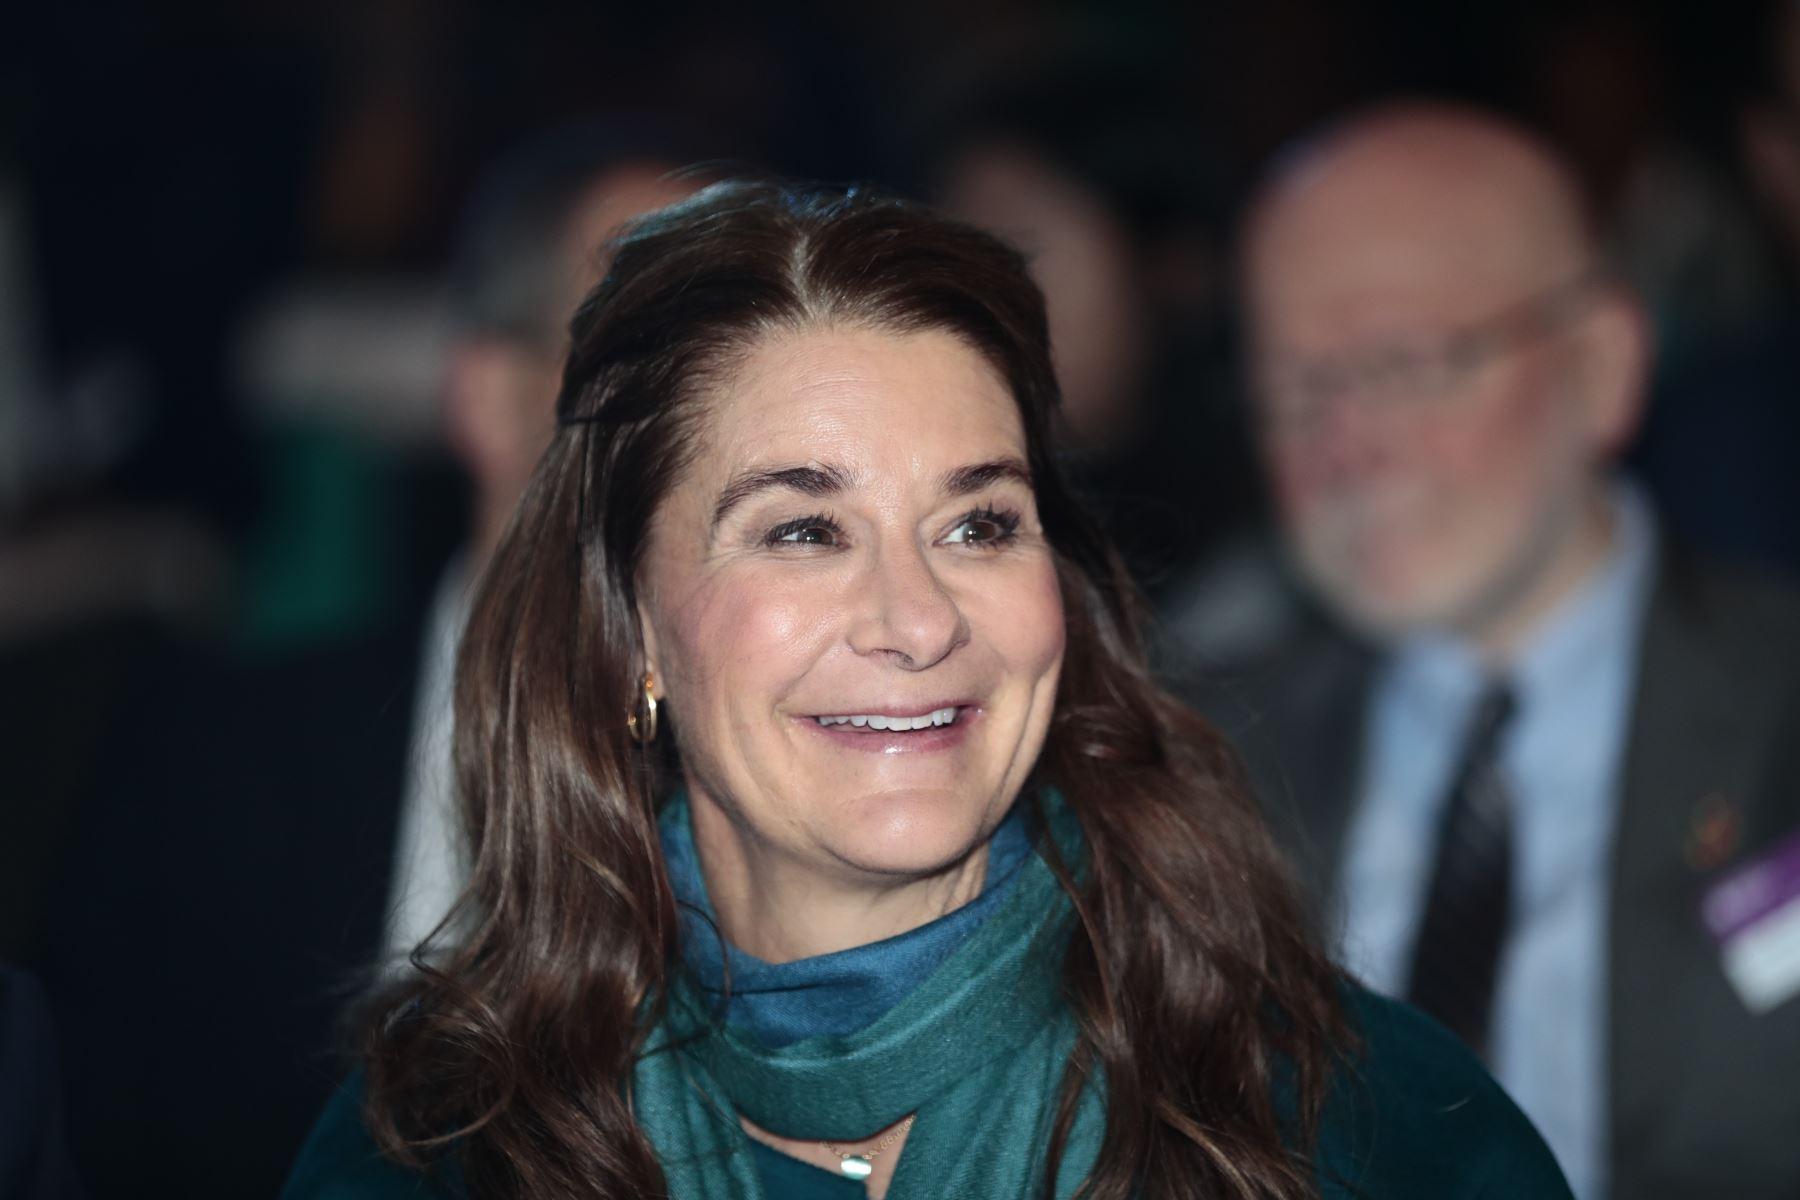 Melinda Gate, copresidenta de Bill & Melinda Gates. AFP